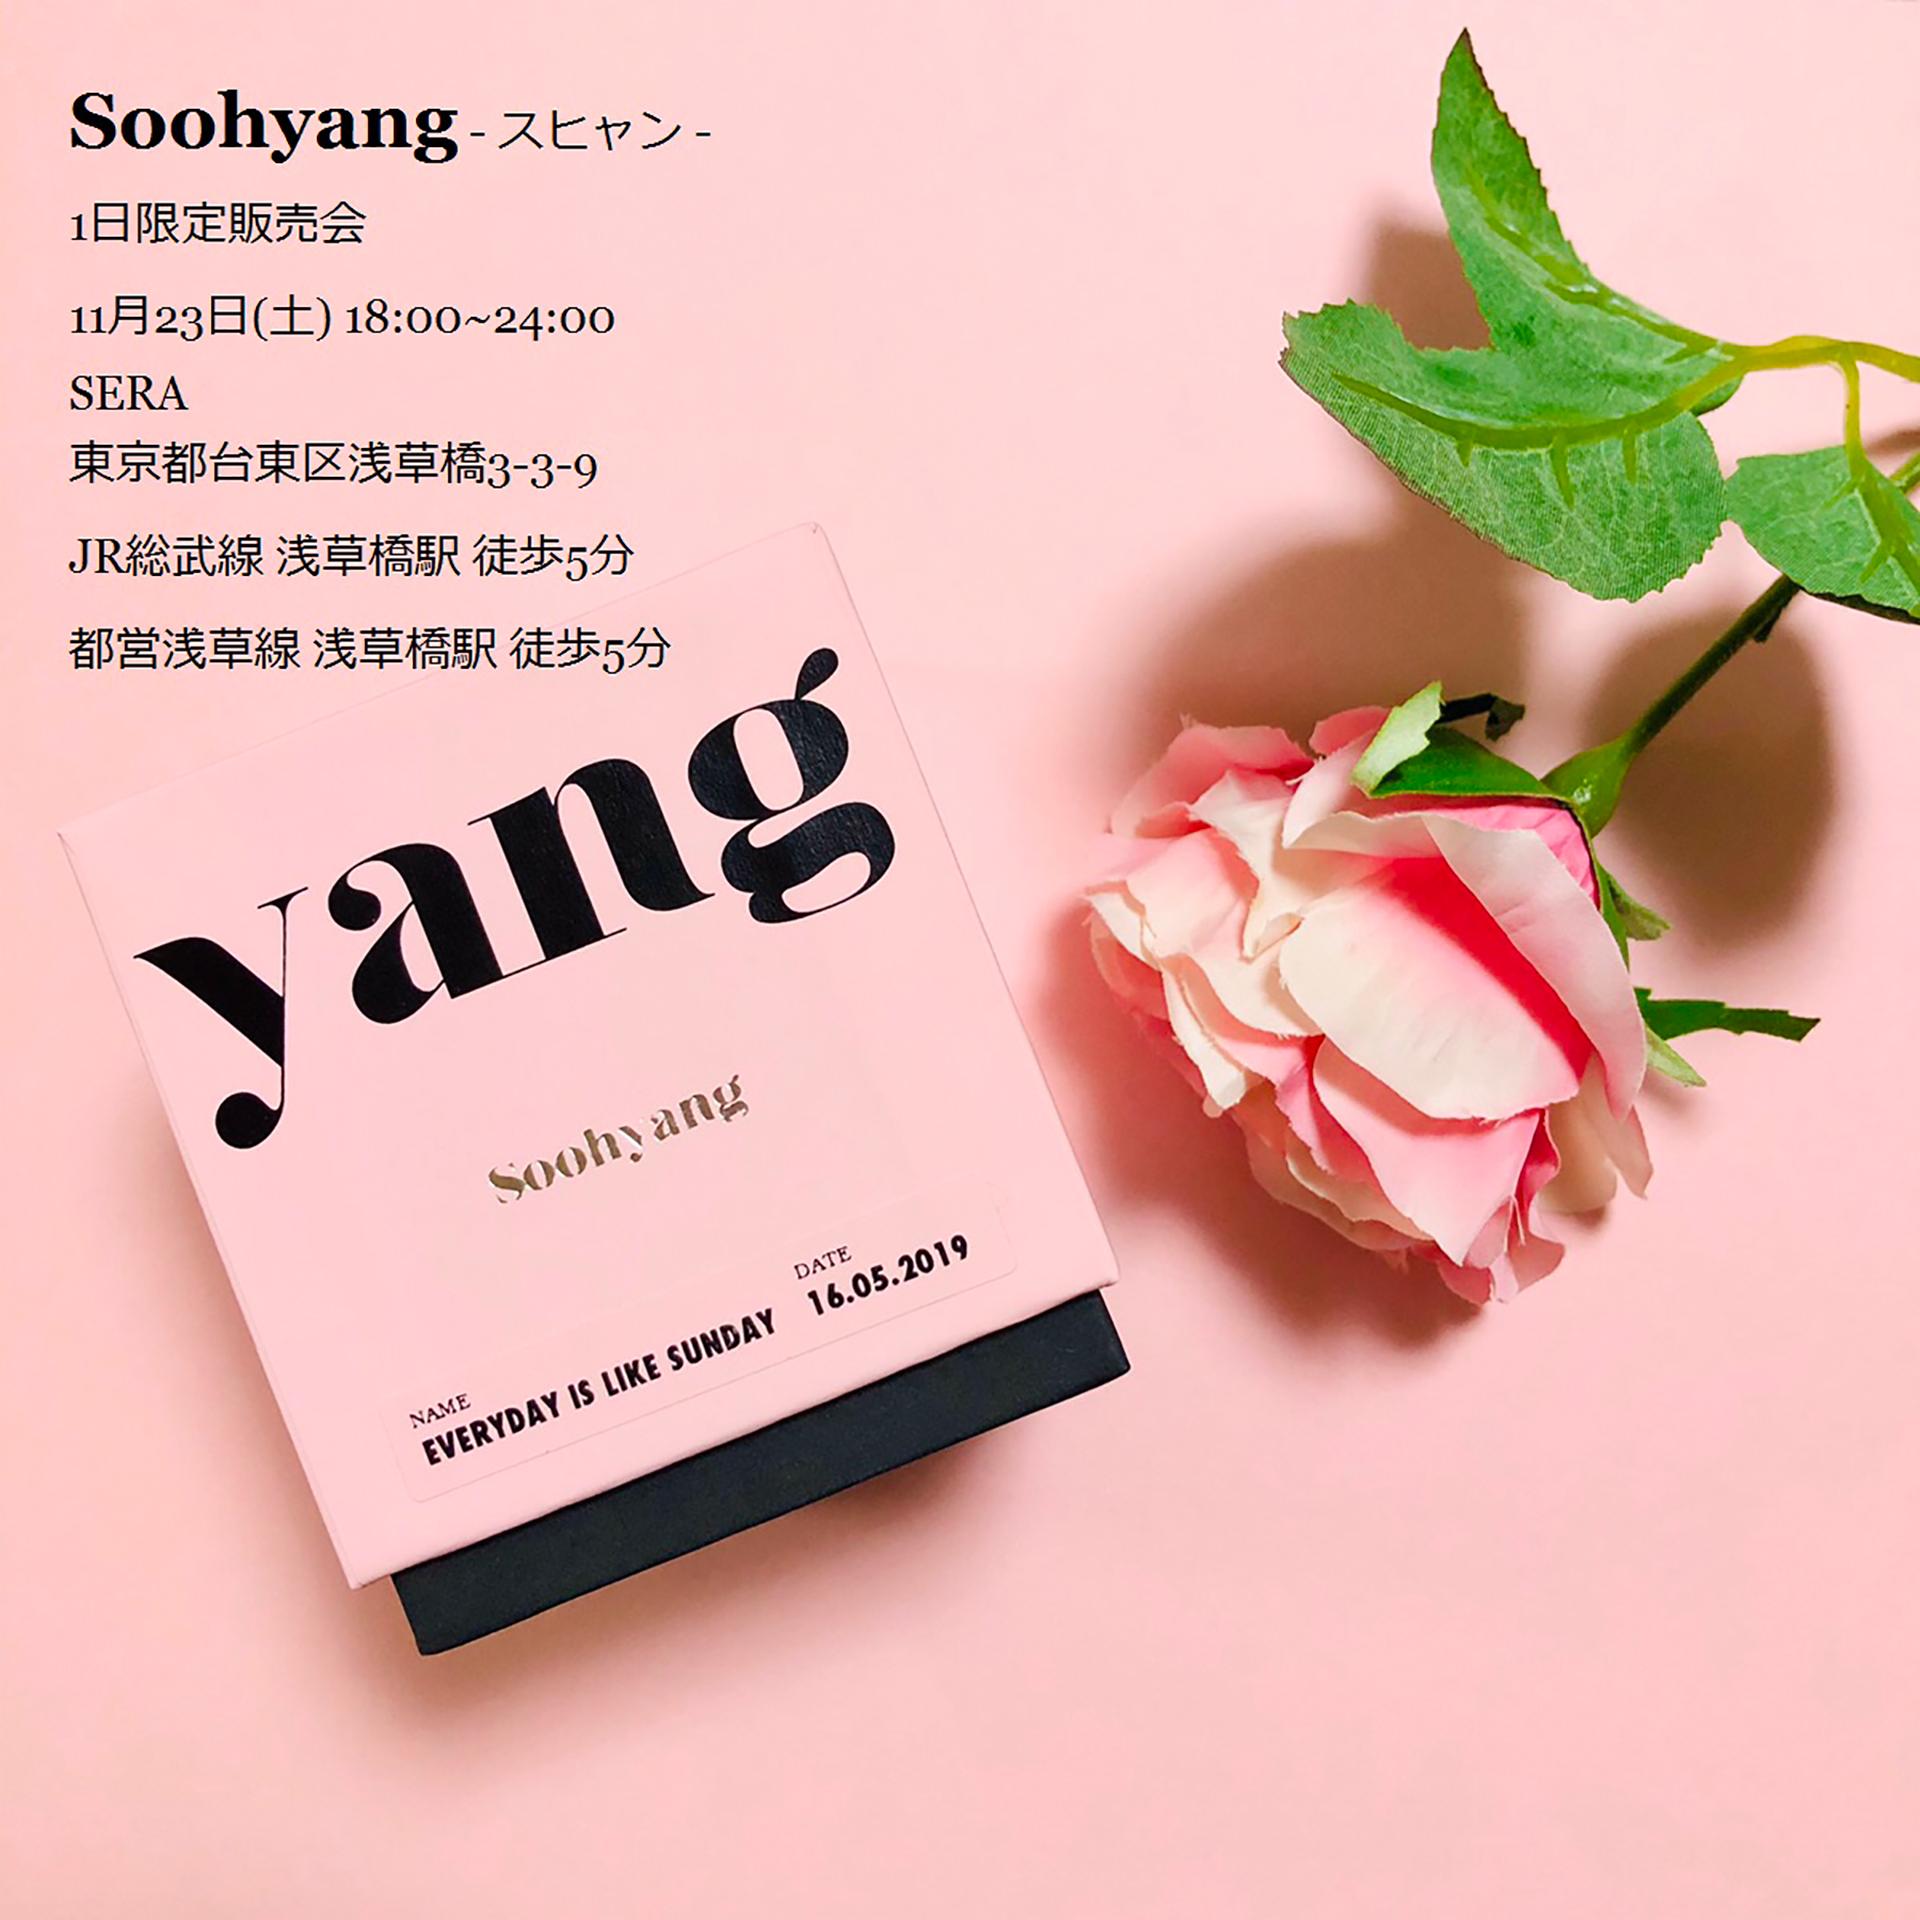 Soohyang - スヒャン -販売会・告知バナー